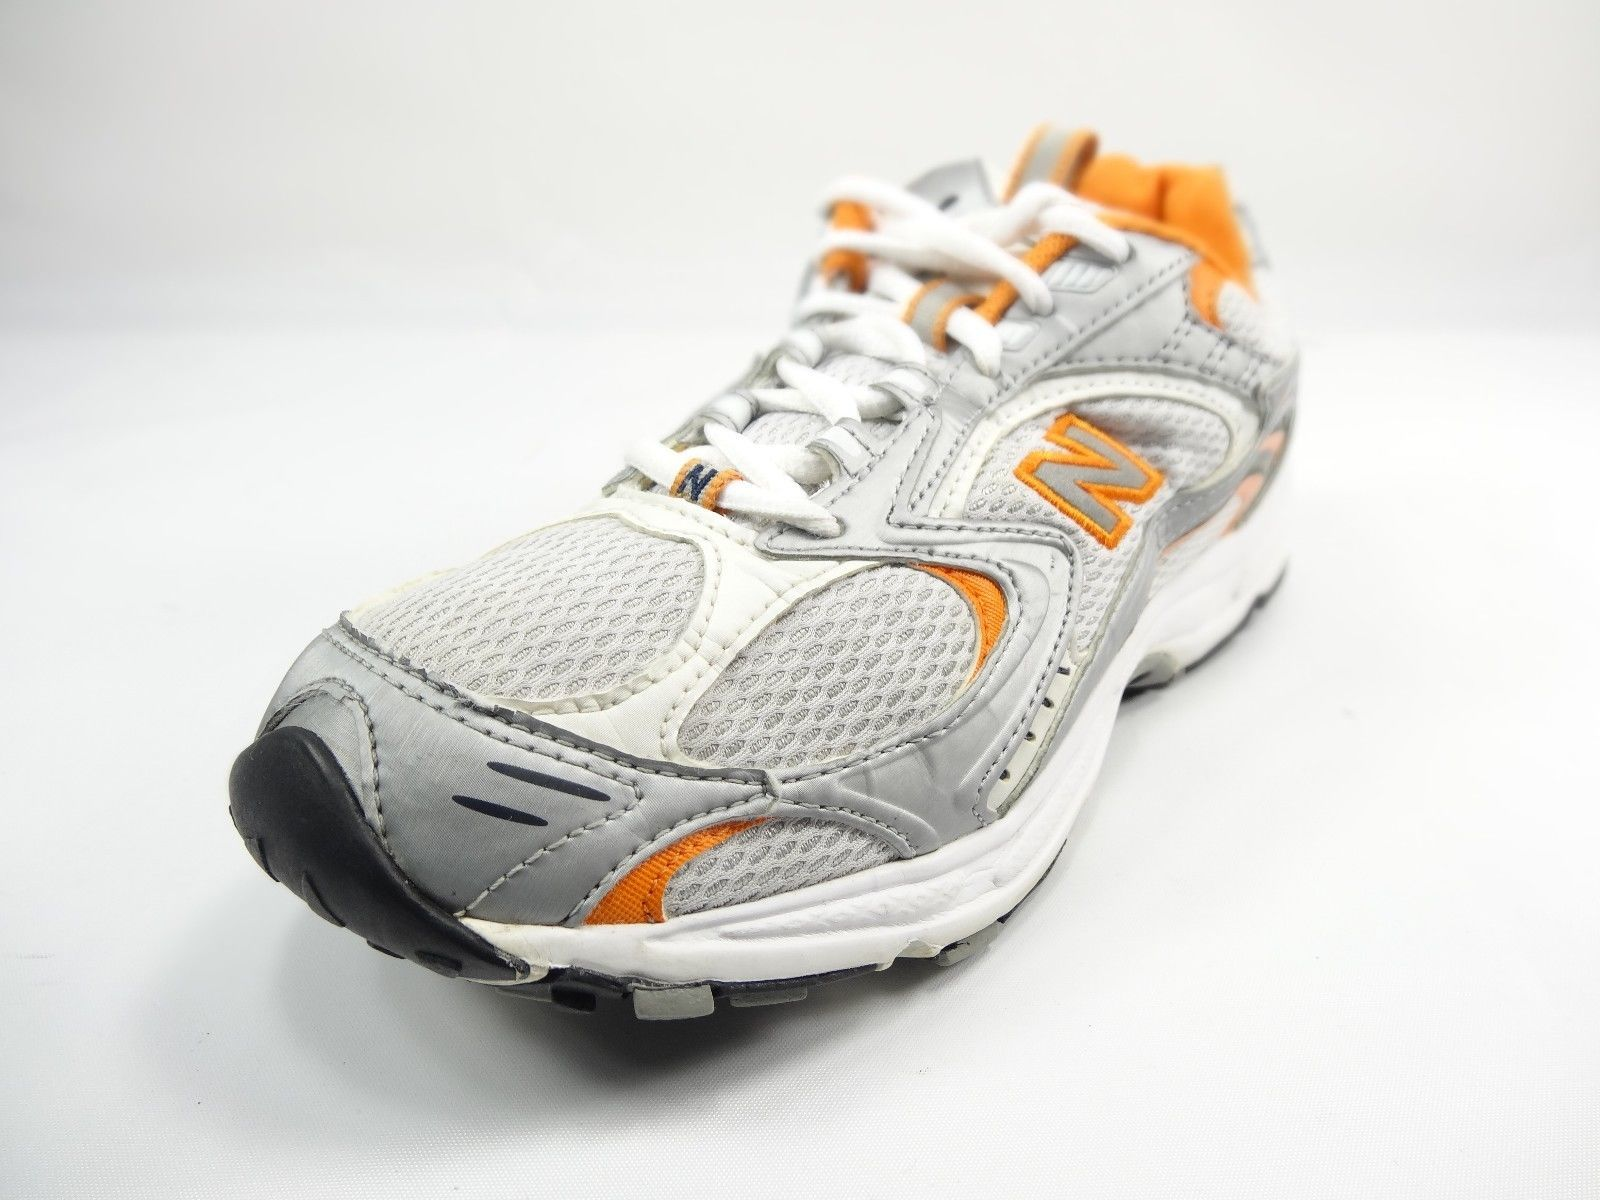 f54f3ab6807bc S l1600. S l1600. Previous. New Balance 411 White/Gray/Orange Running Womens  Shoes Size 8.5B